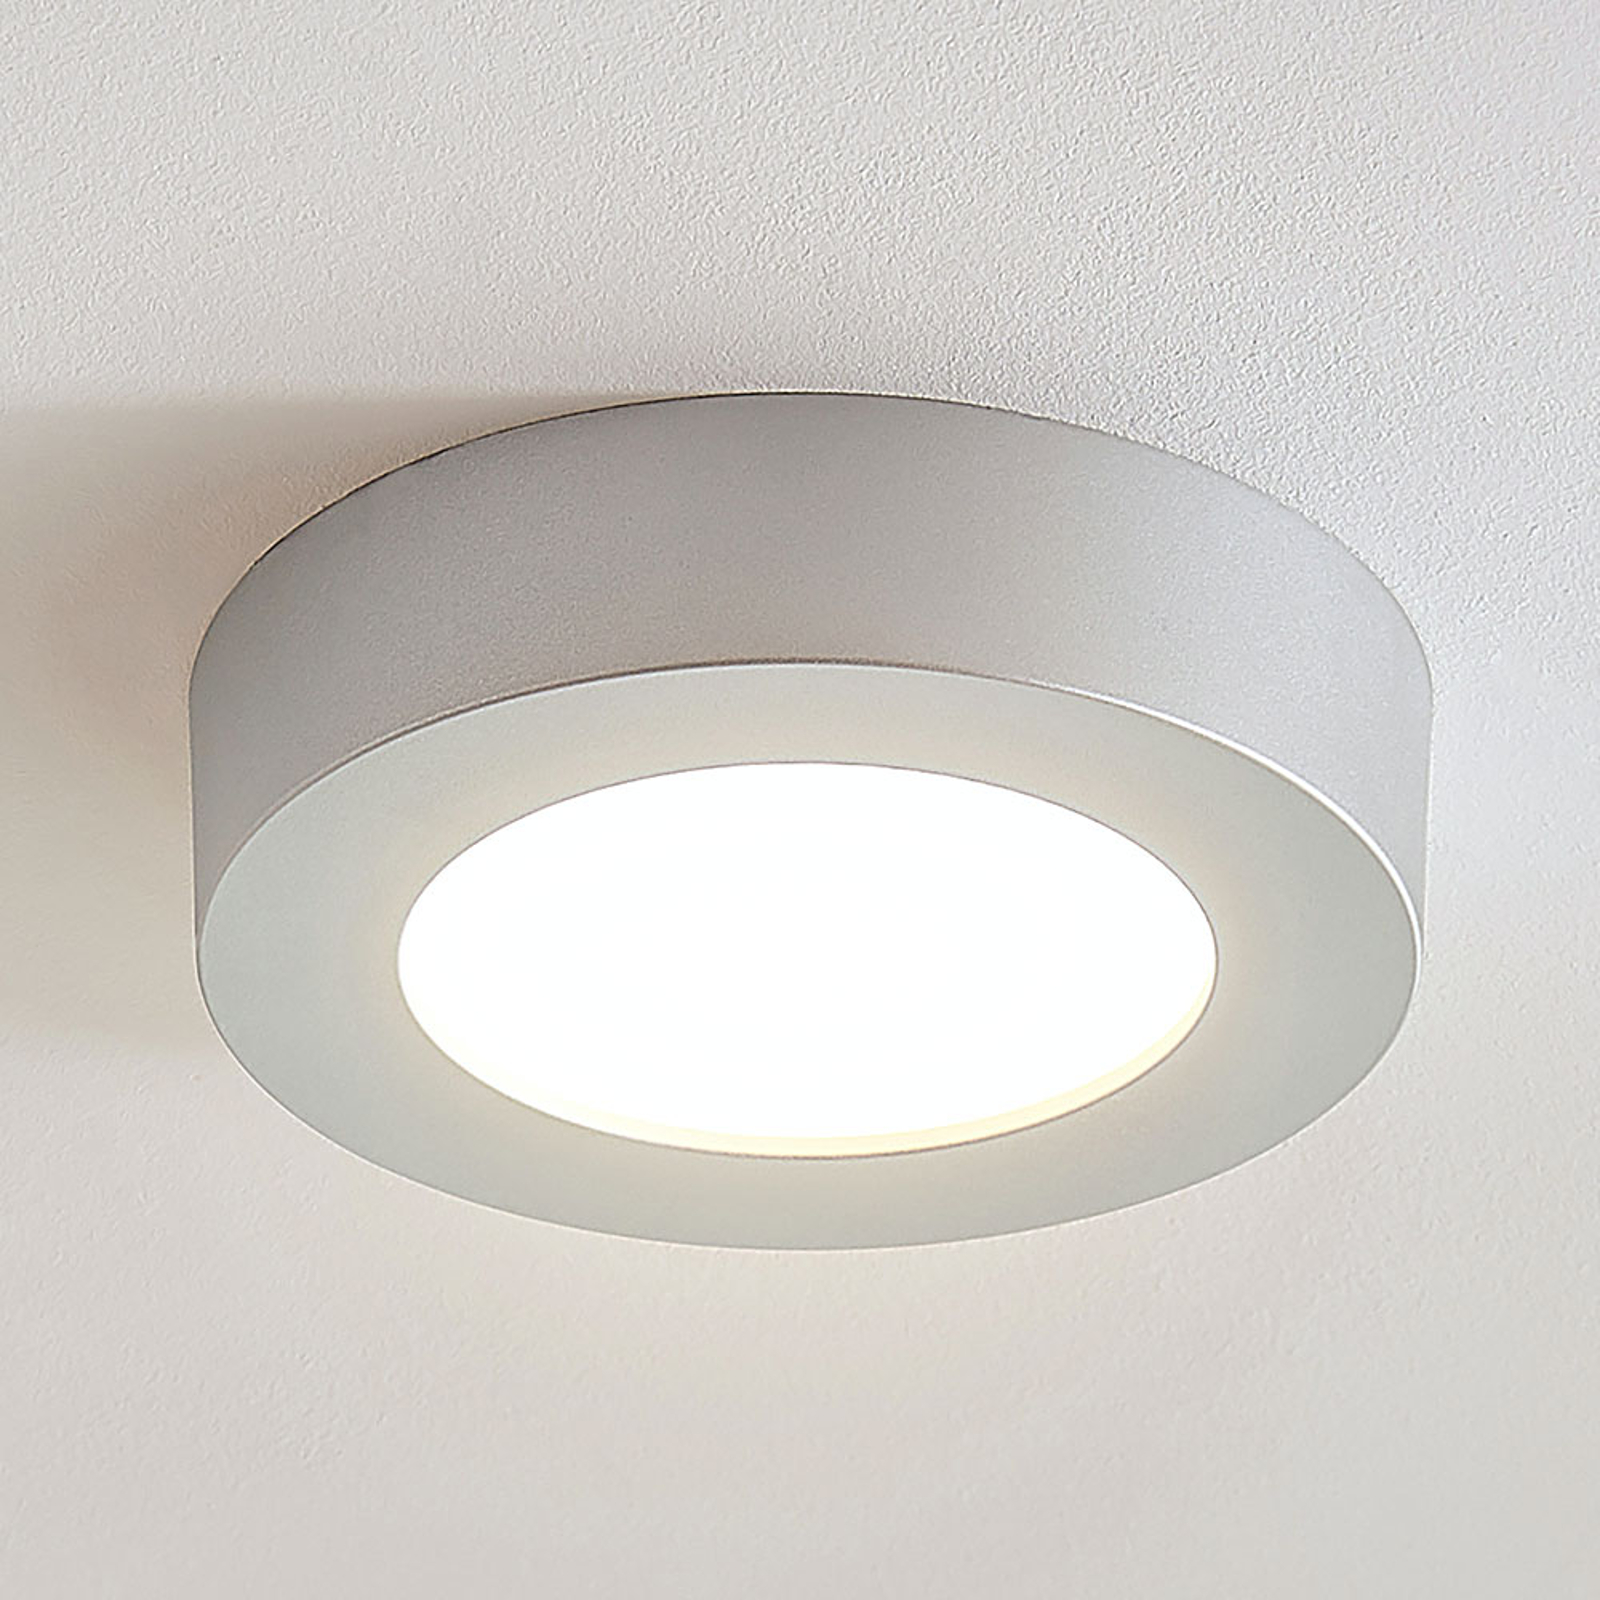 LED-taklampe Marlo sølv 3 000K rund 18,2cm